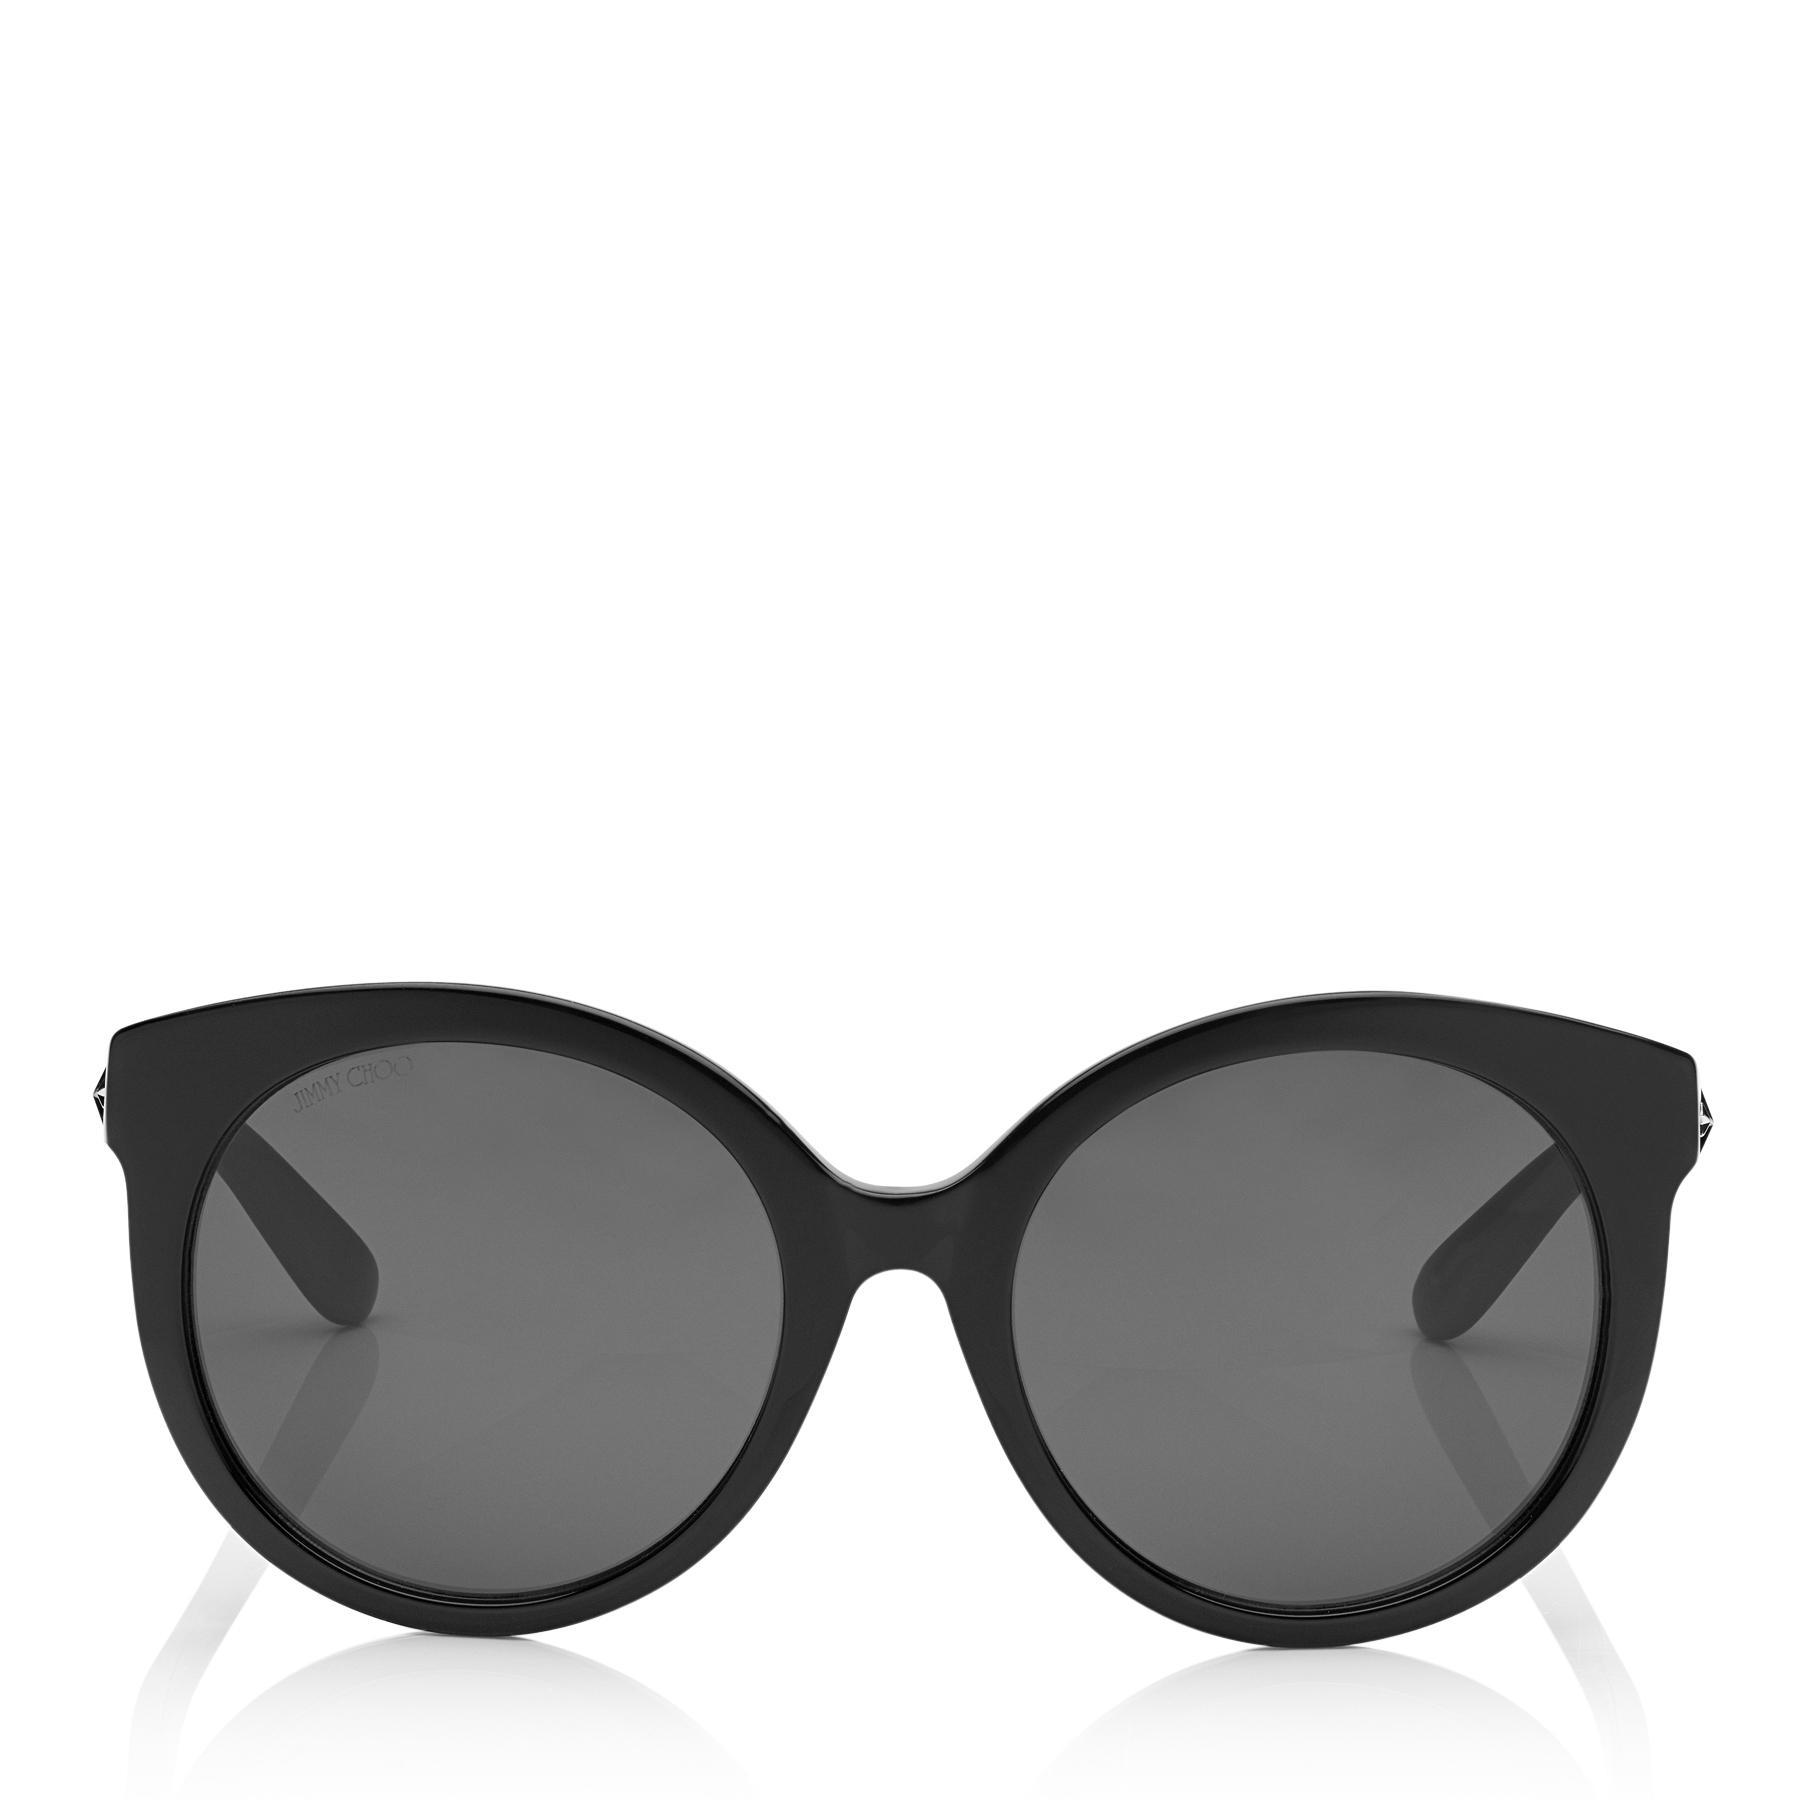 5f23e2d8a92 Jimmy Choo. Women s Astar Black Oversized Sunglasses With Star Stud  Detailing